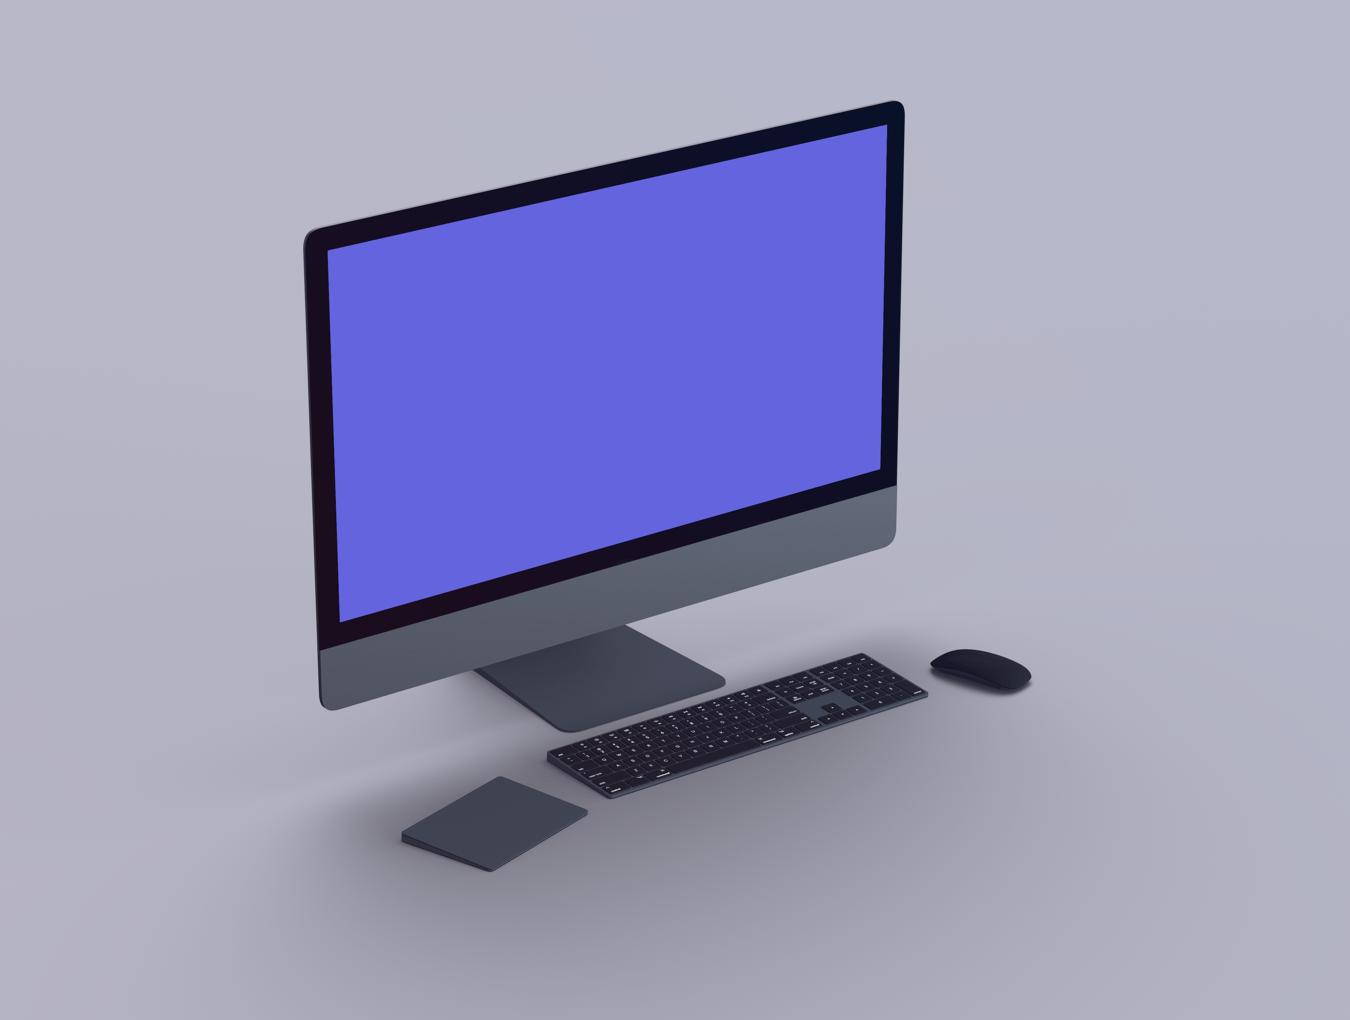 mockup monitor mac thumb download designe 1